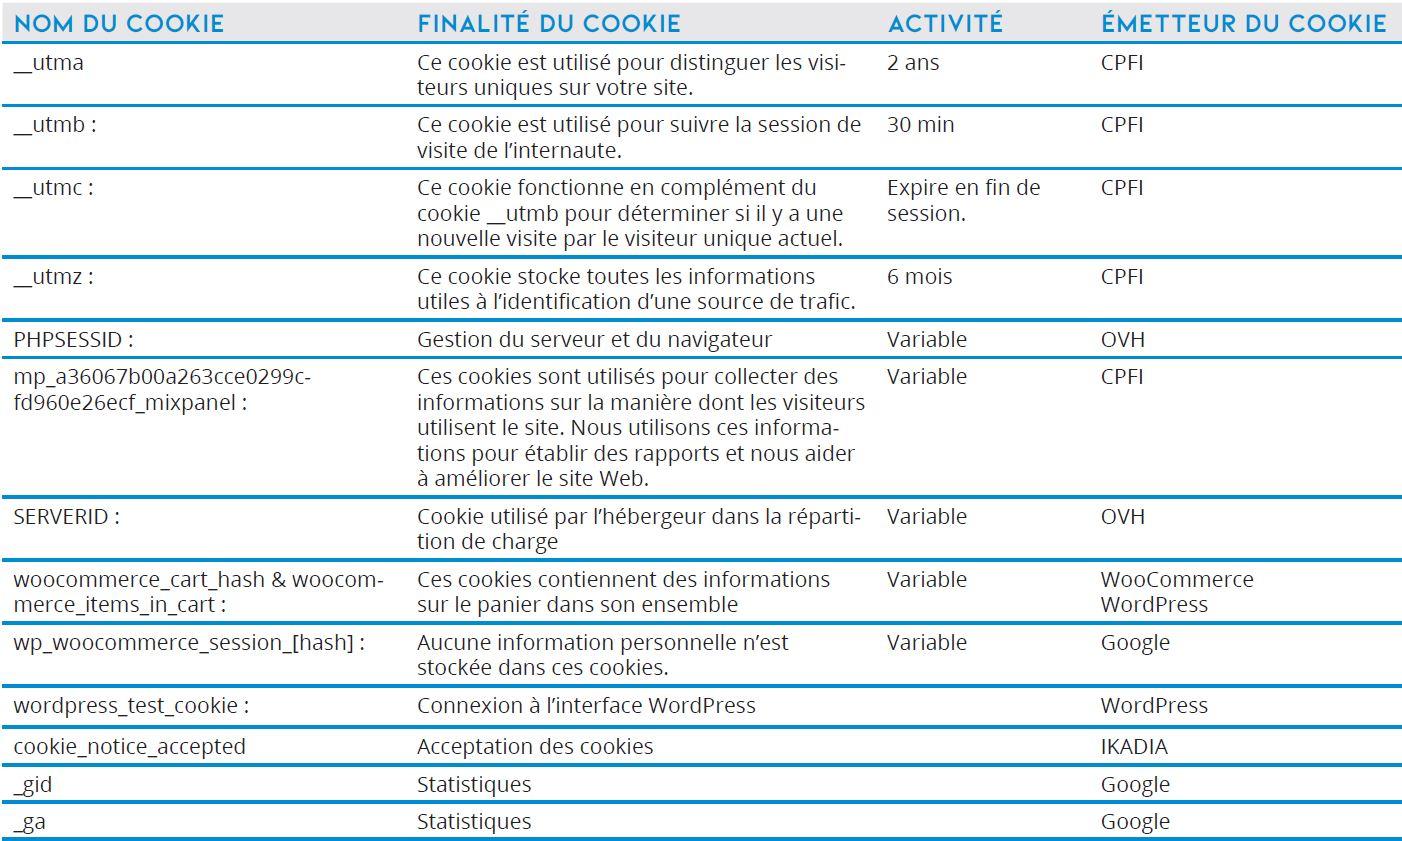 cpfi-rgpd-cookie